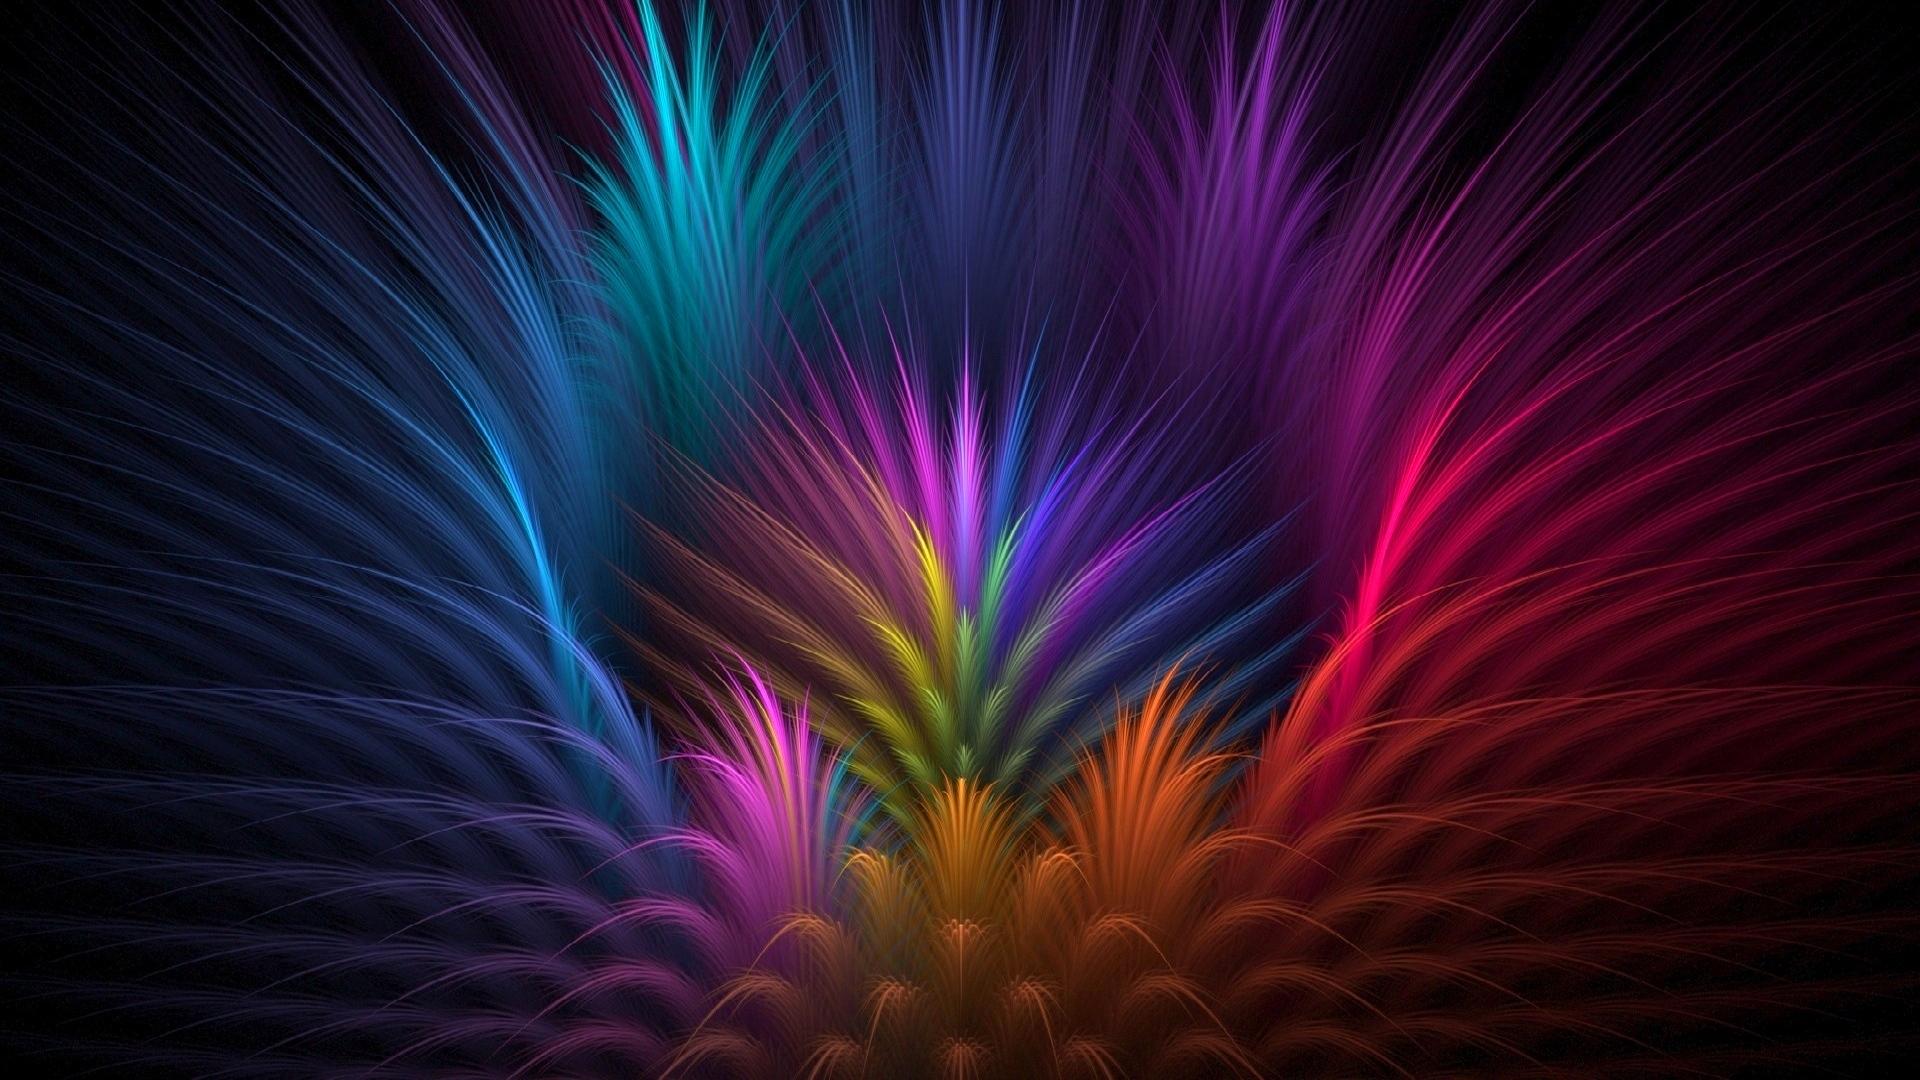 Feathers Flower Petals Rays Line Volume Symmetry   Stock 1920x1080